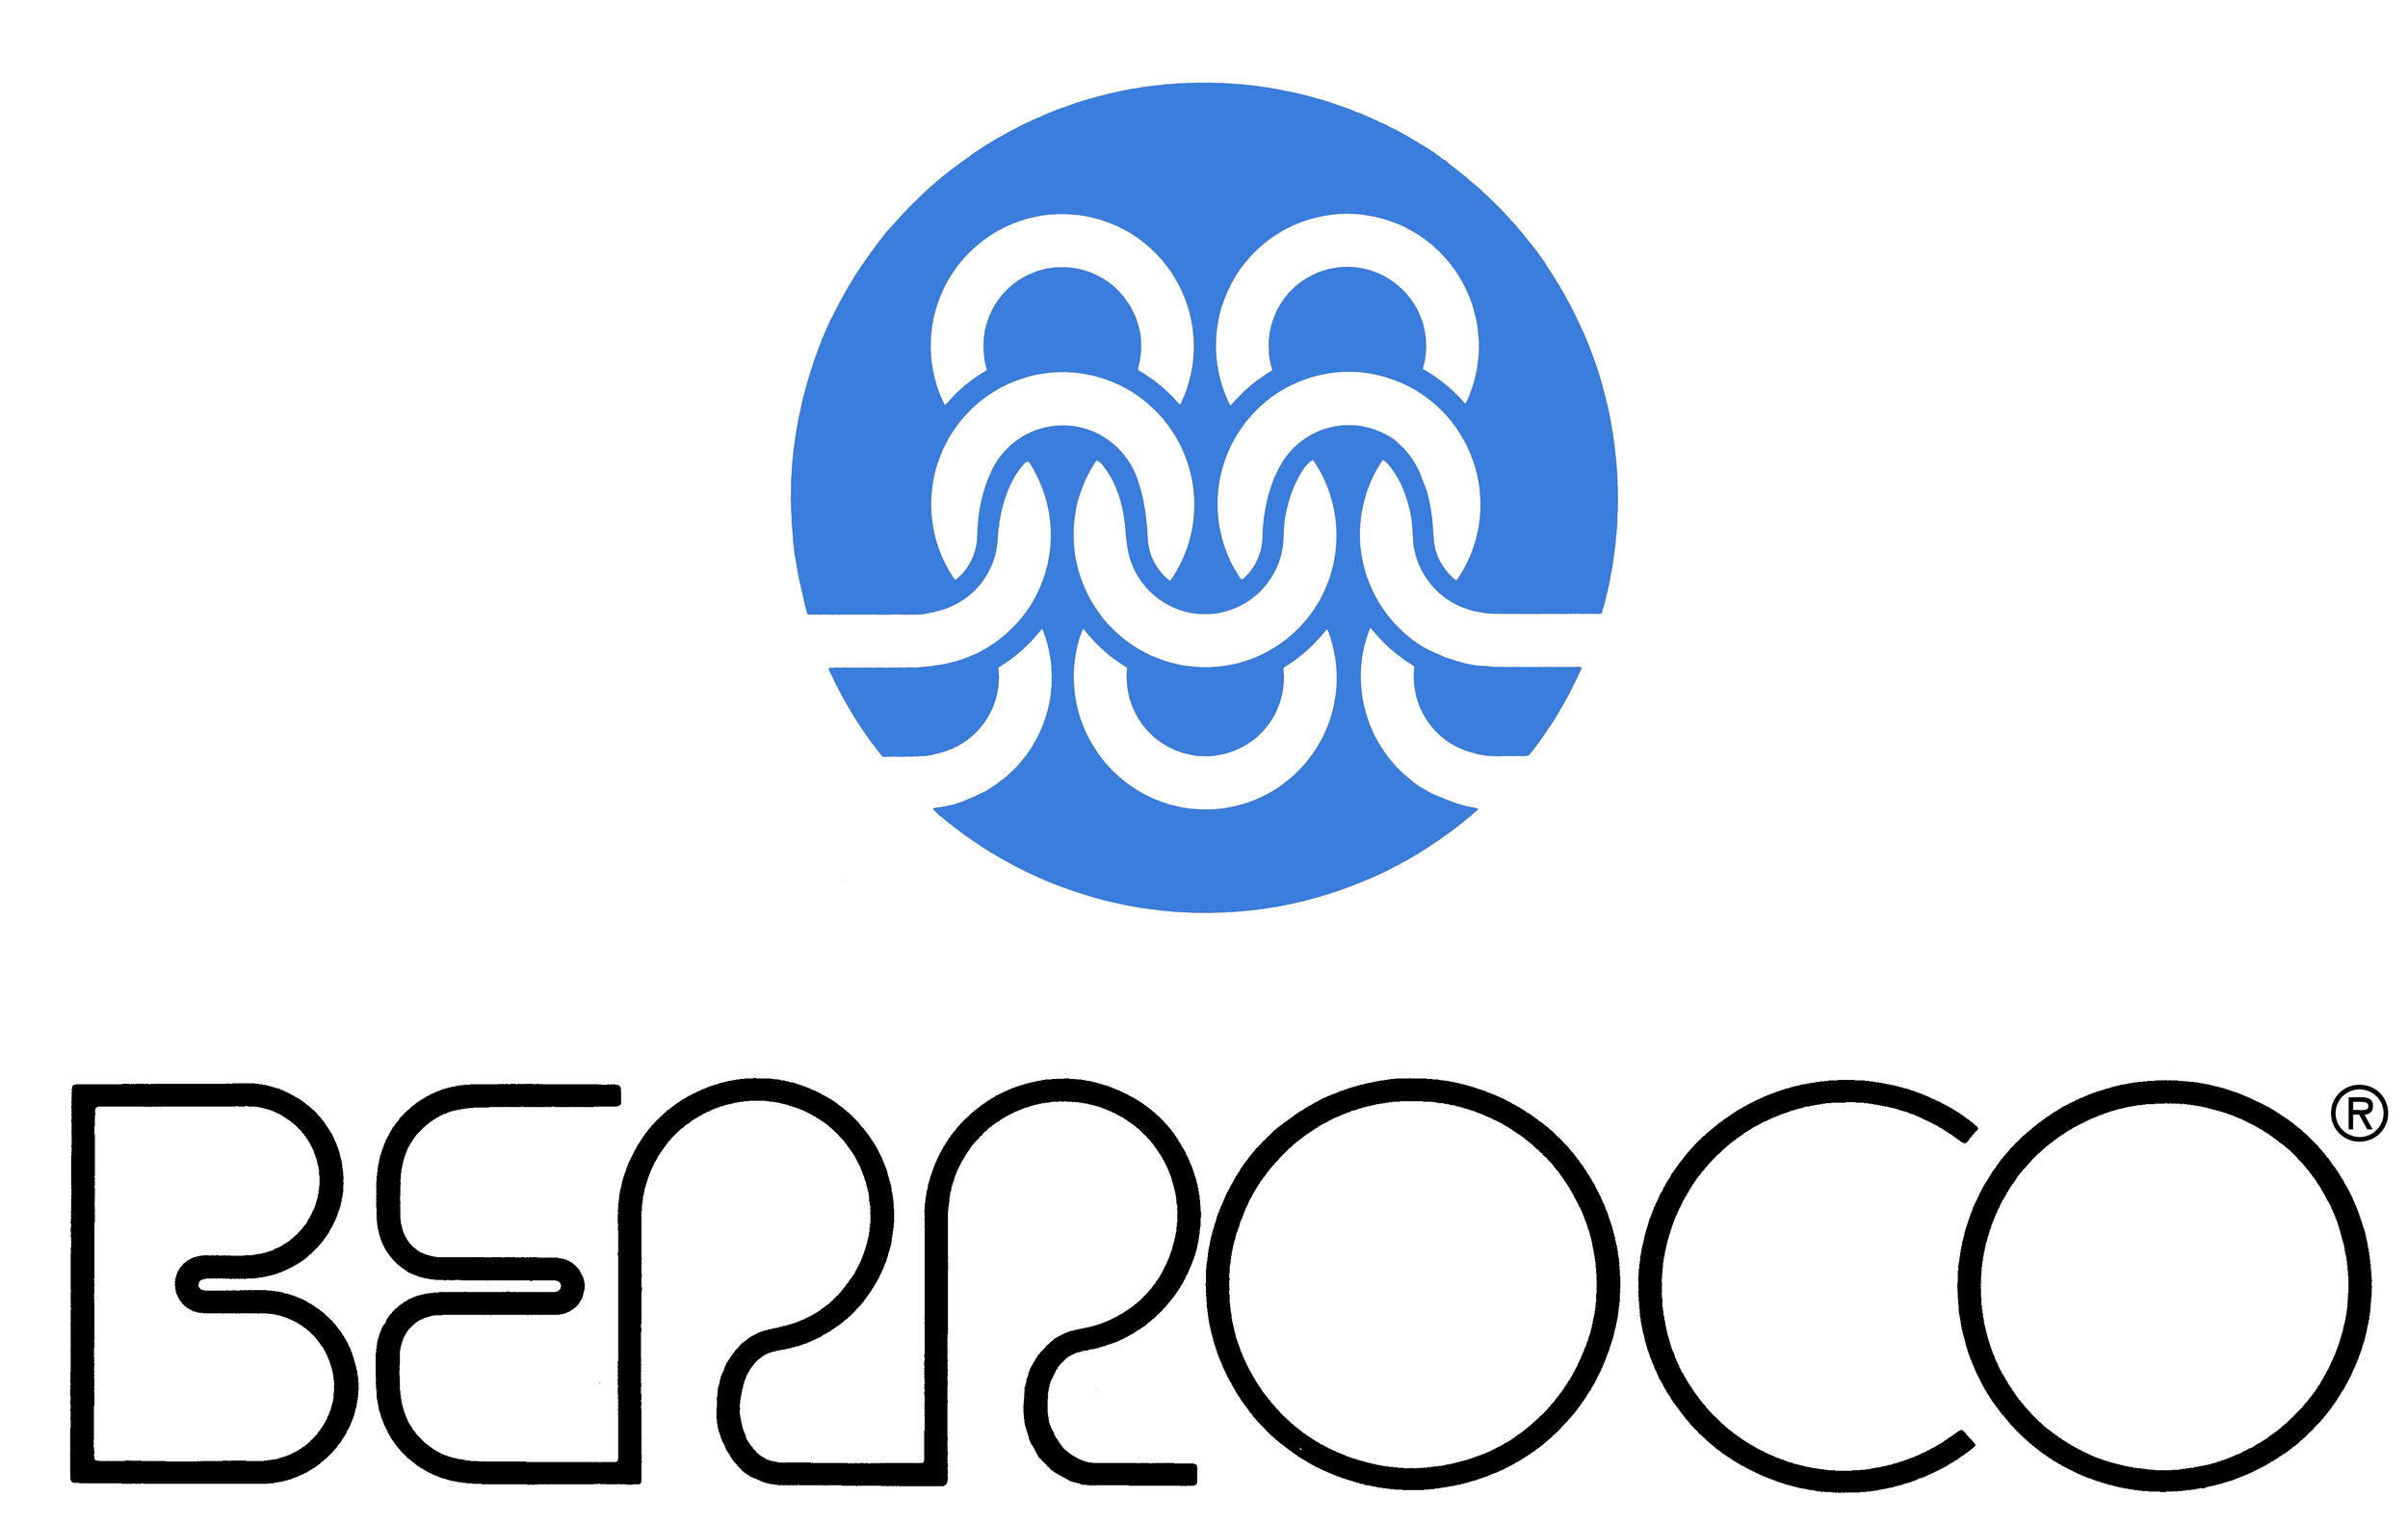 Berroco Logo_V1_Blue copy.jpg